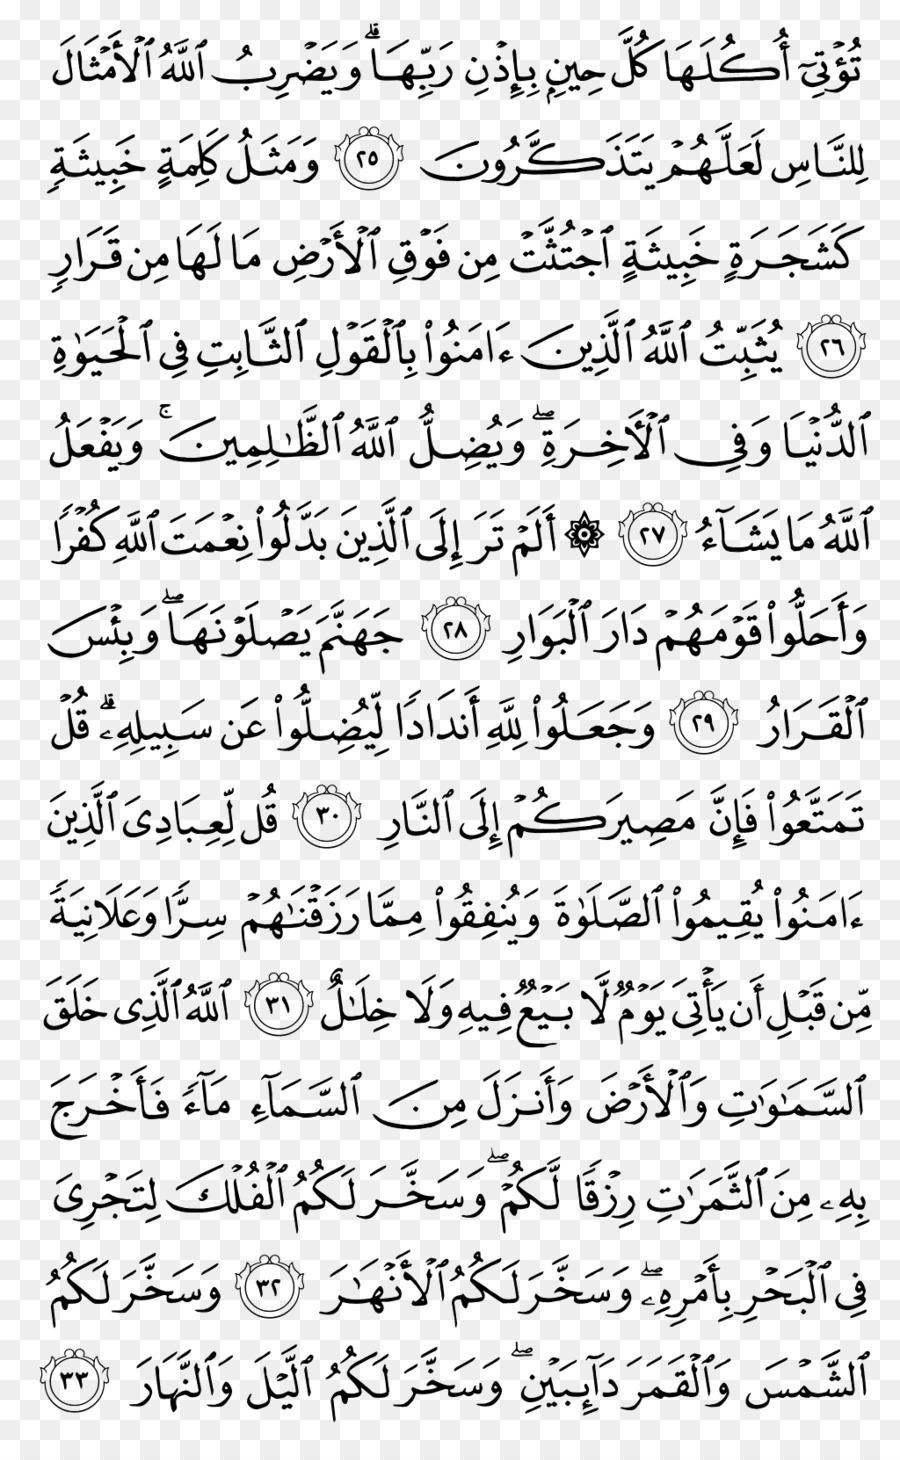 Quran Background png download - 1024*1656 - Free Transparent